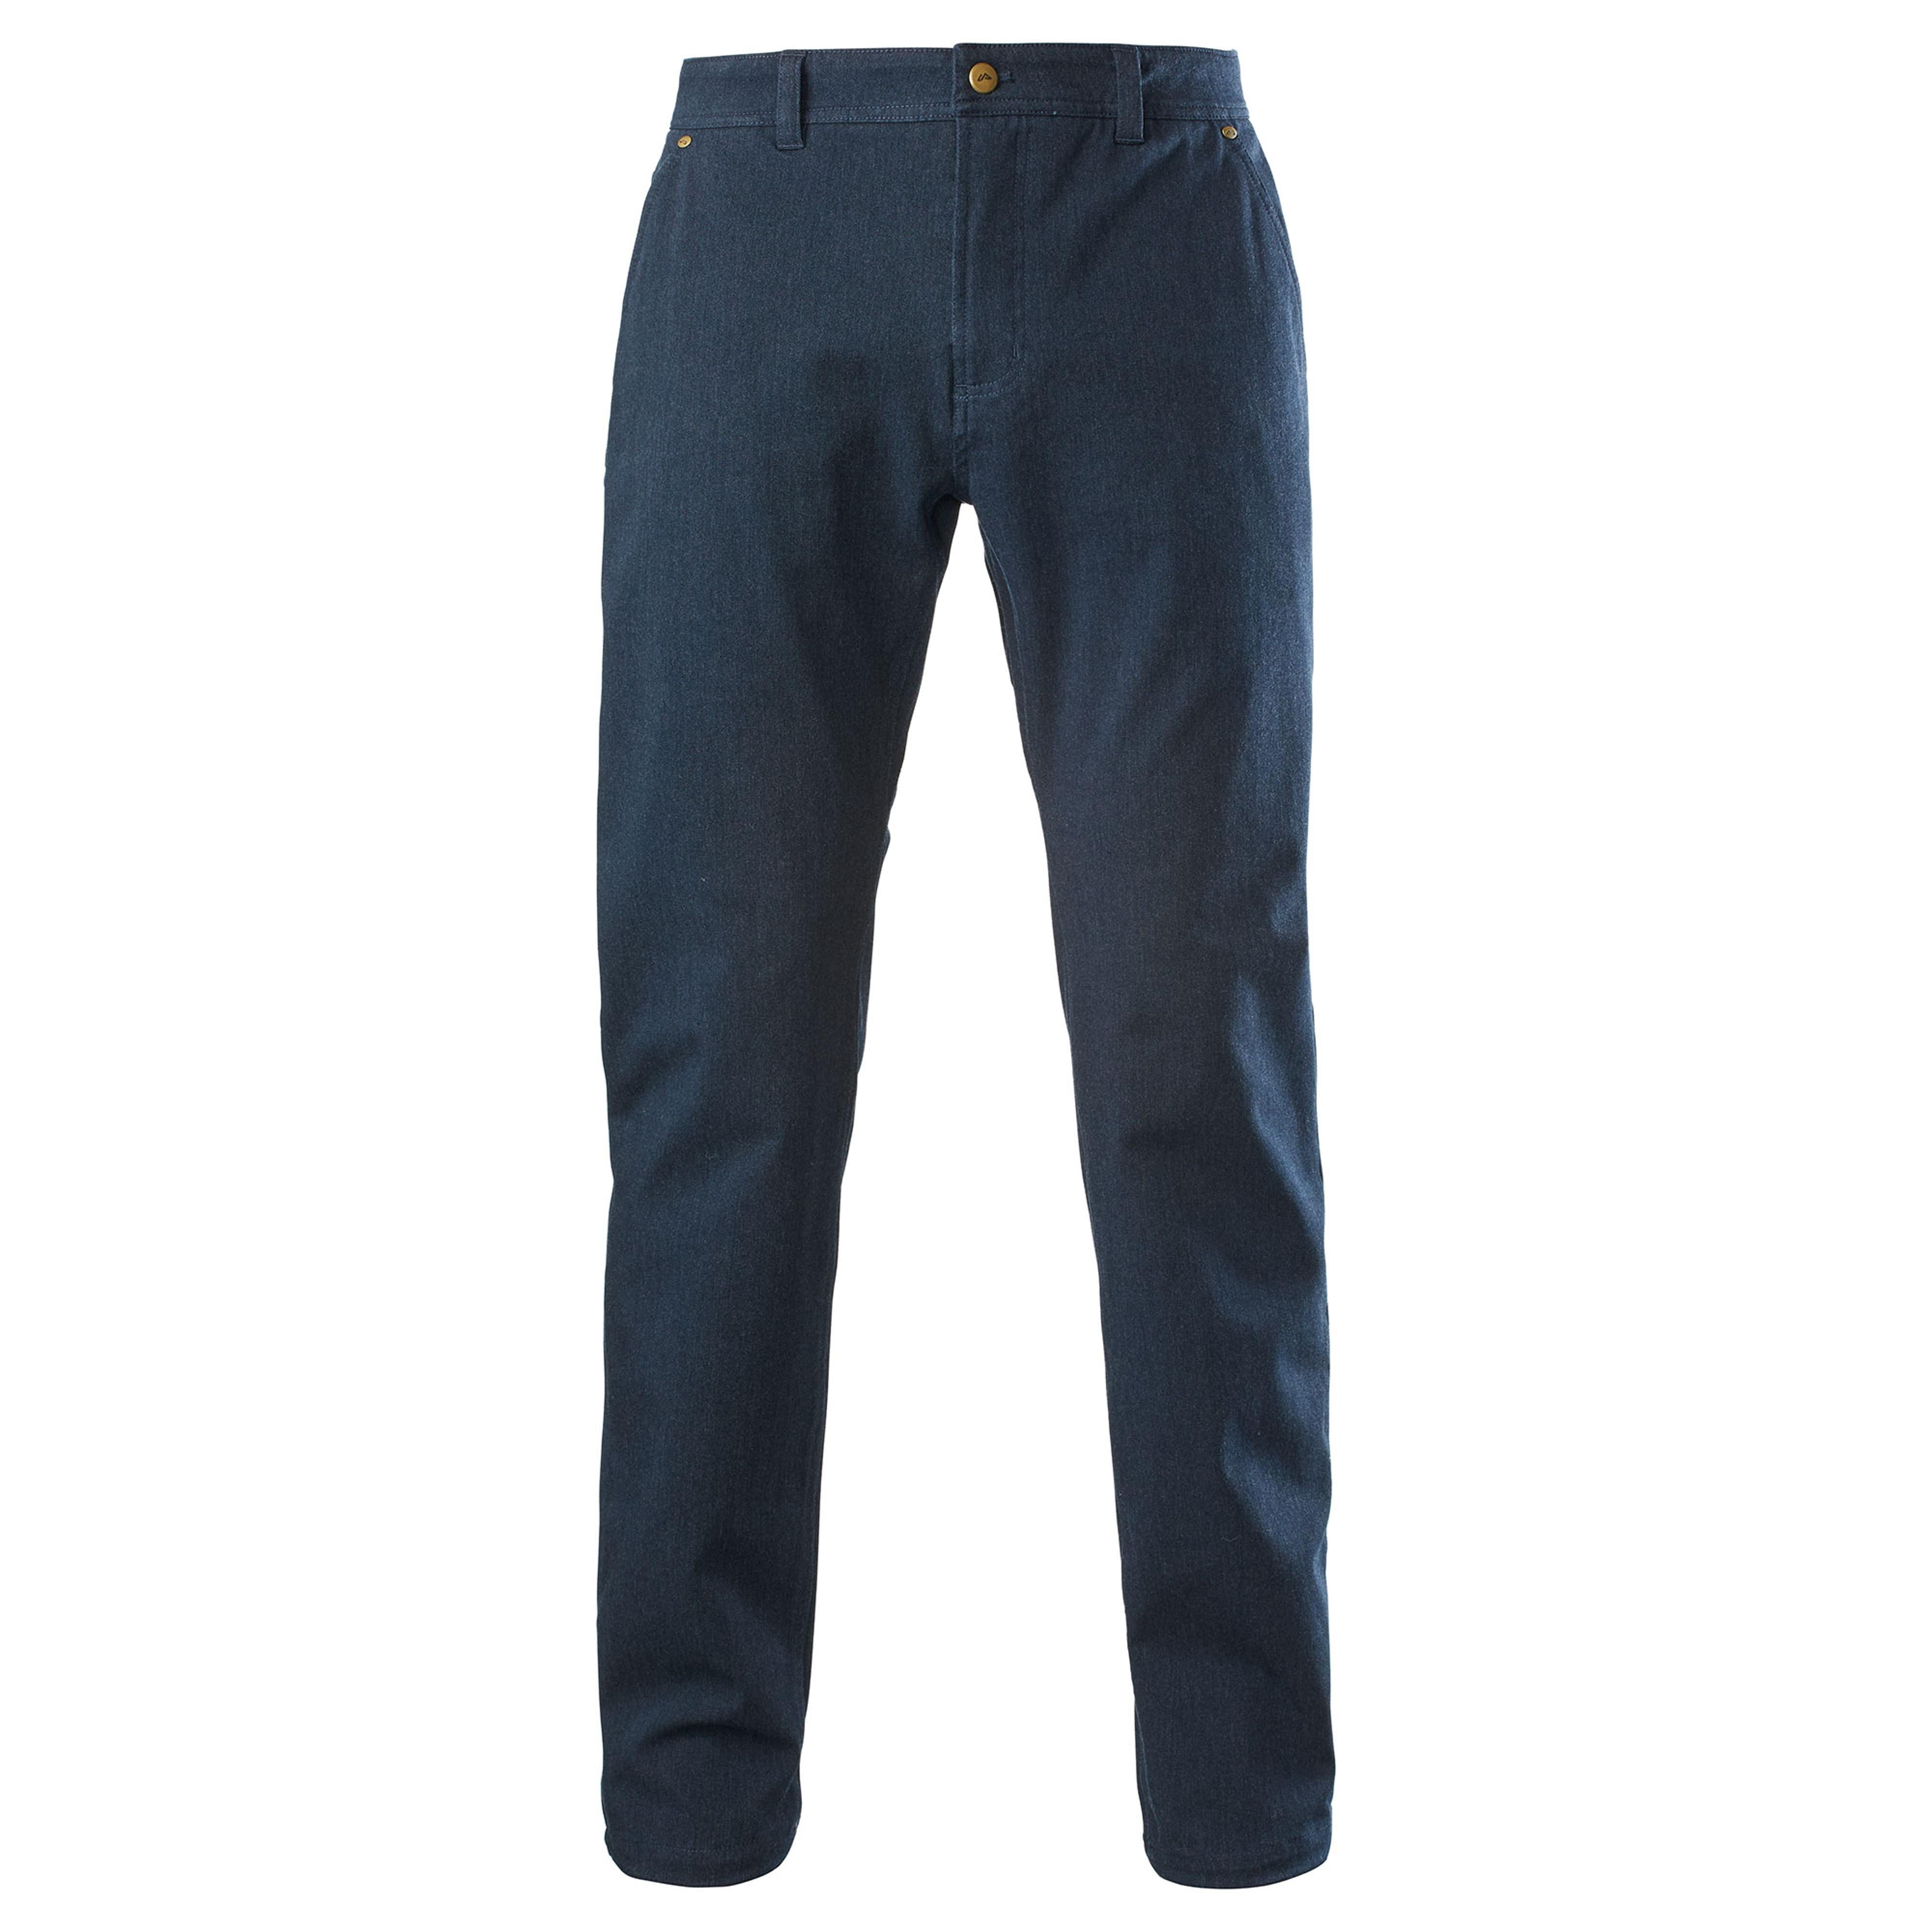 66a65a2cd578 Men's Pants & Shorts | Travel, Hiking & Outdoor Pants | AU